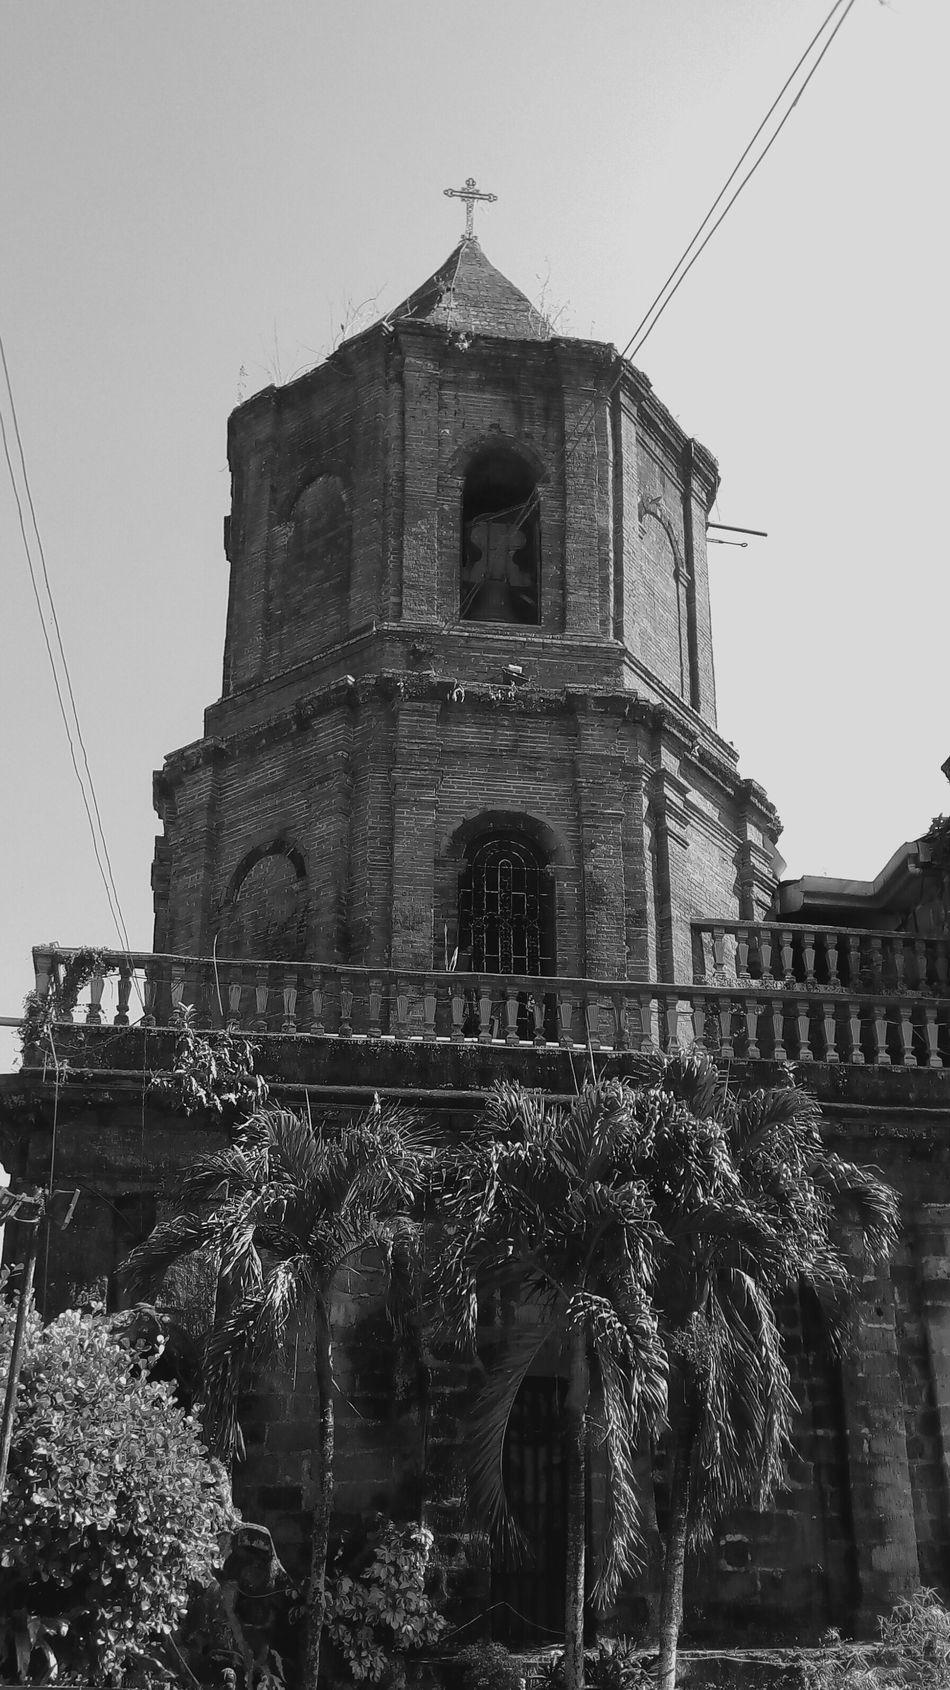 Pila Bell Tower Church Bell Tower Churchyard Black & White Eyeem Black And White Heritage Site Blackandwhite Photography Blackandwhite Church Front Black And White Old Church Bell Cross